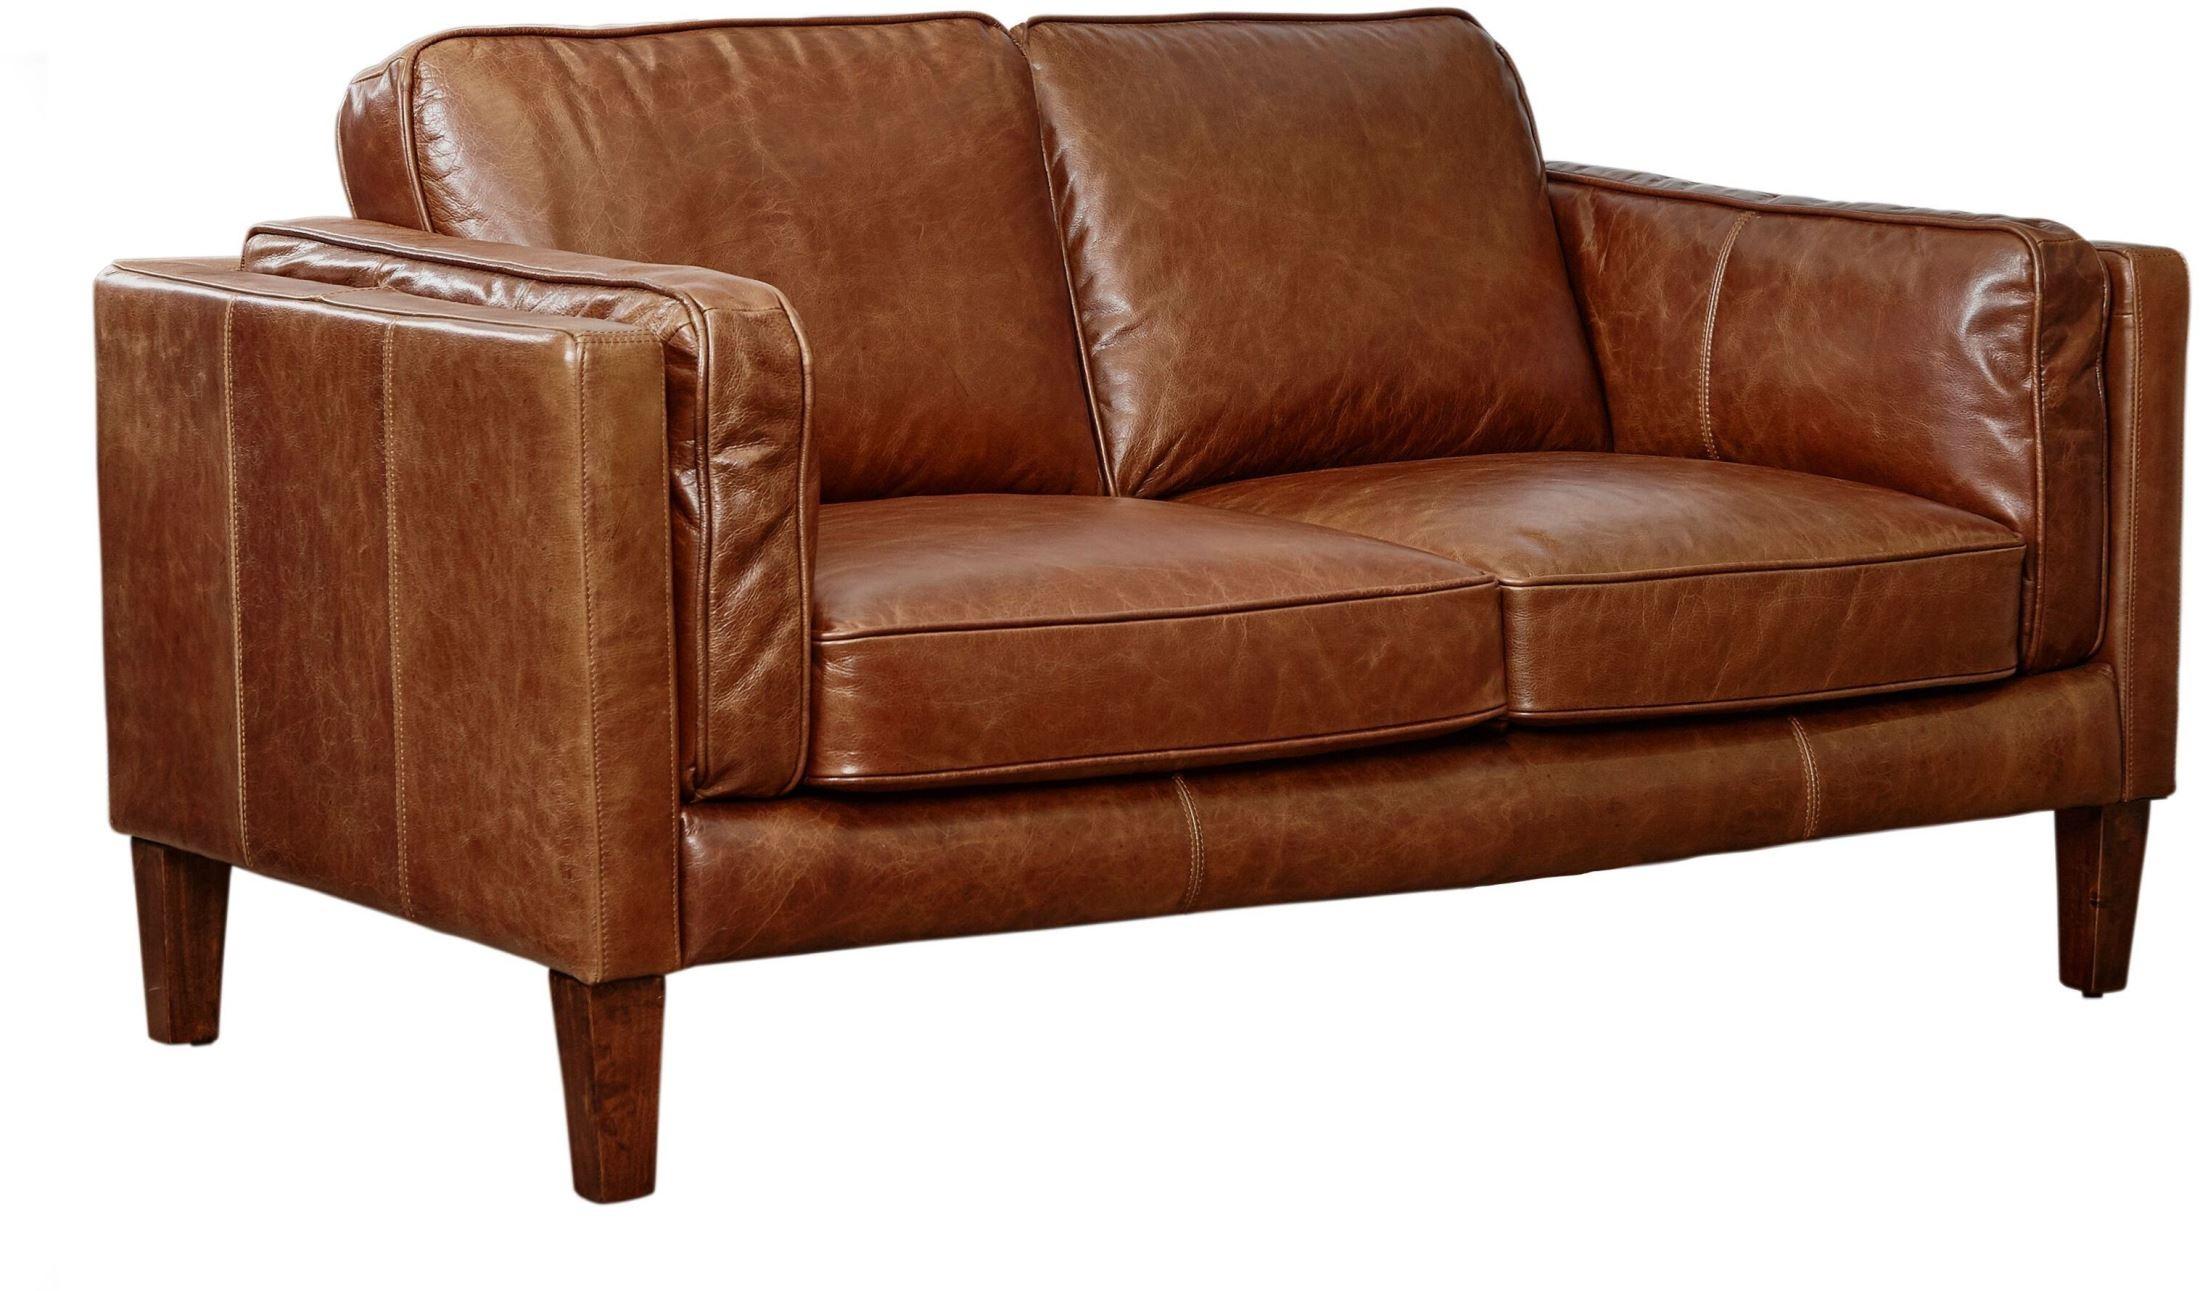 Berkley Cocoa Brompton Vintage Leather Loveseat From